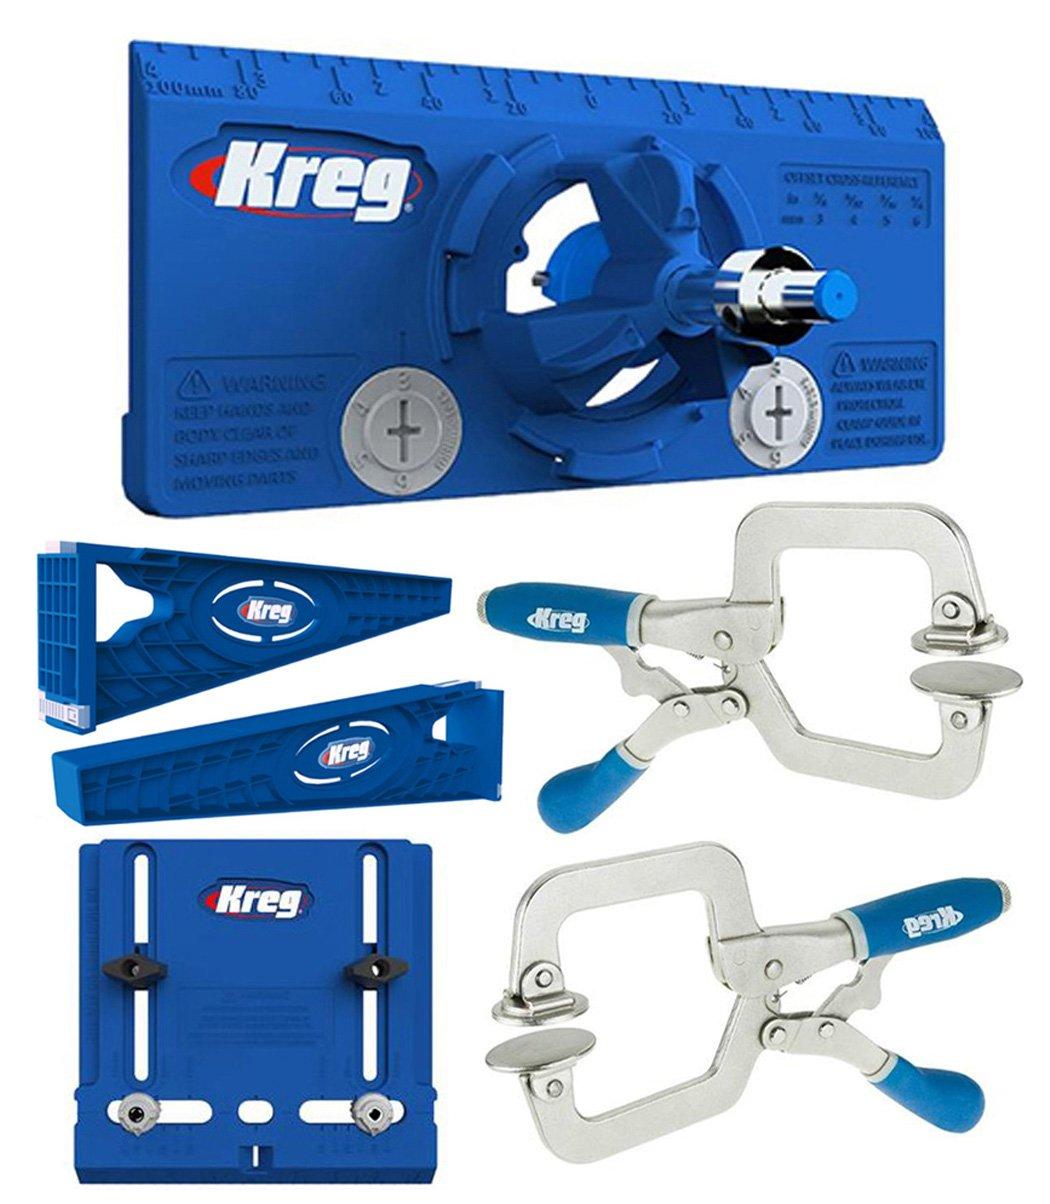 Kreg Drawer Slide Mounting Tool, Cabinet Hardware Jig, Hinge Jig, & 2 Face Clamps by Kreg